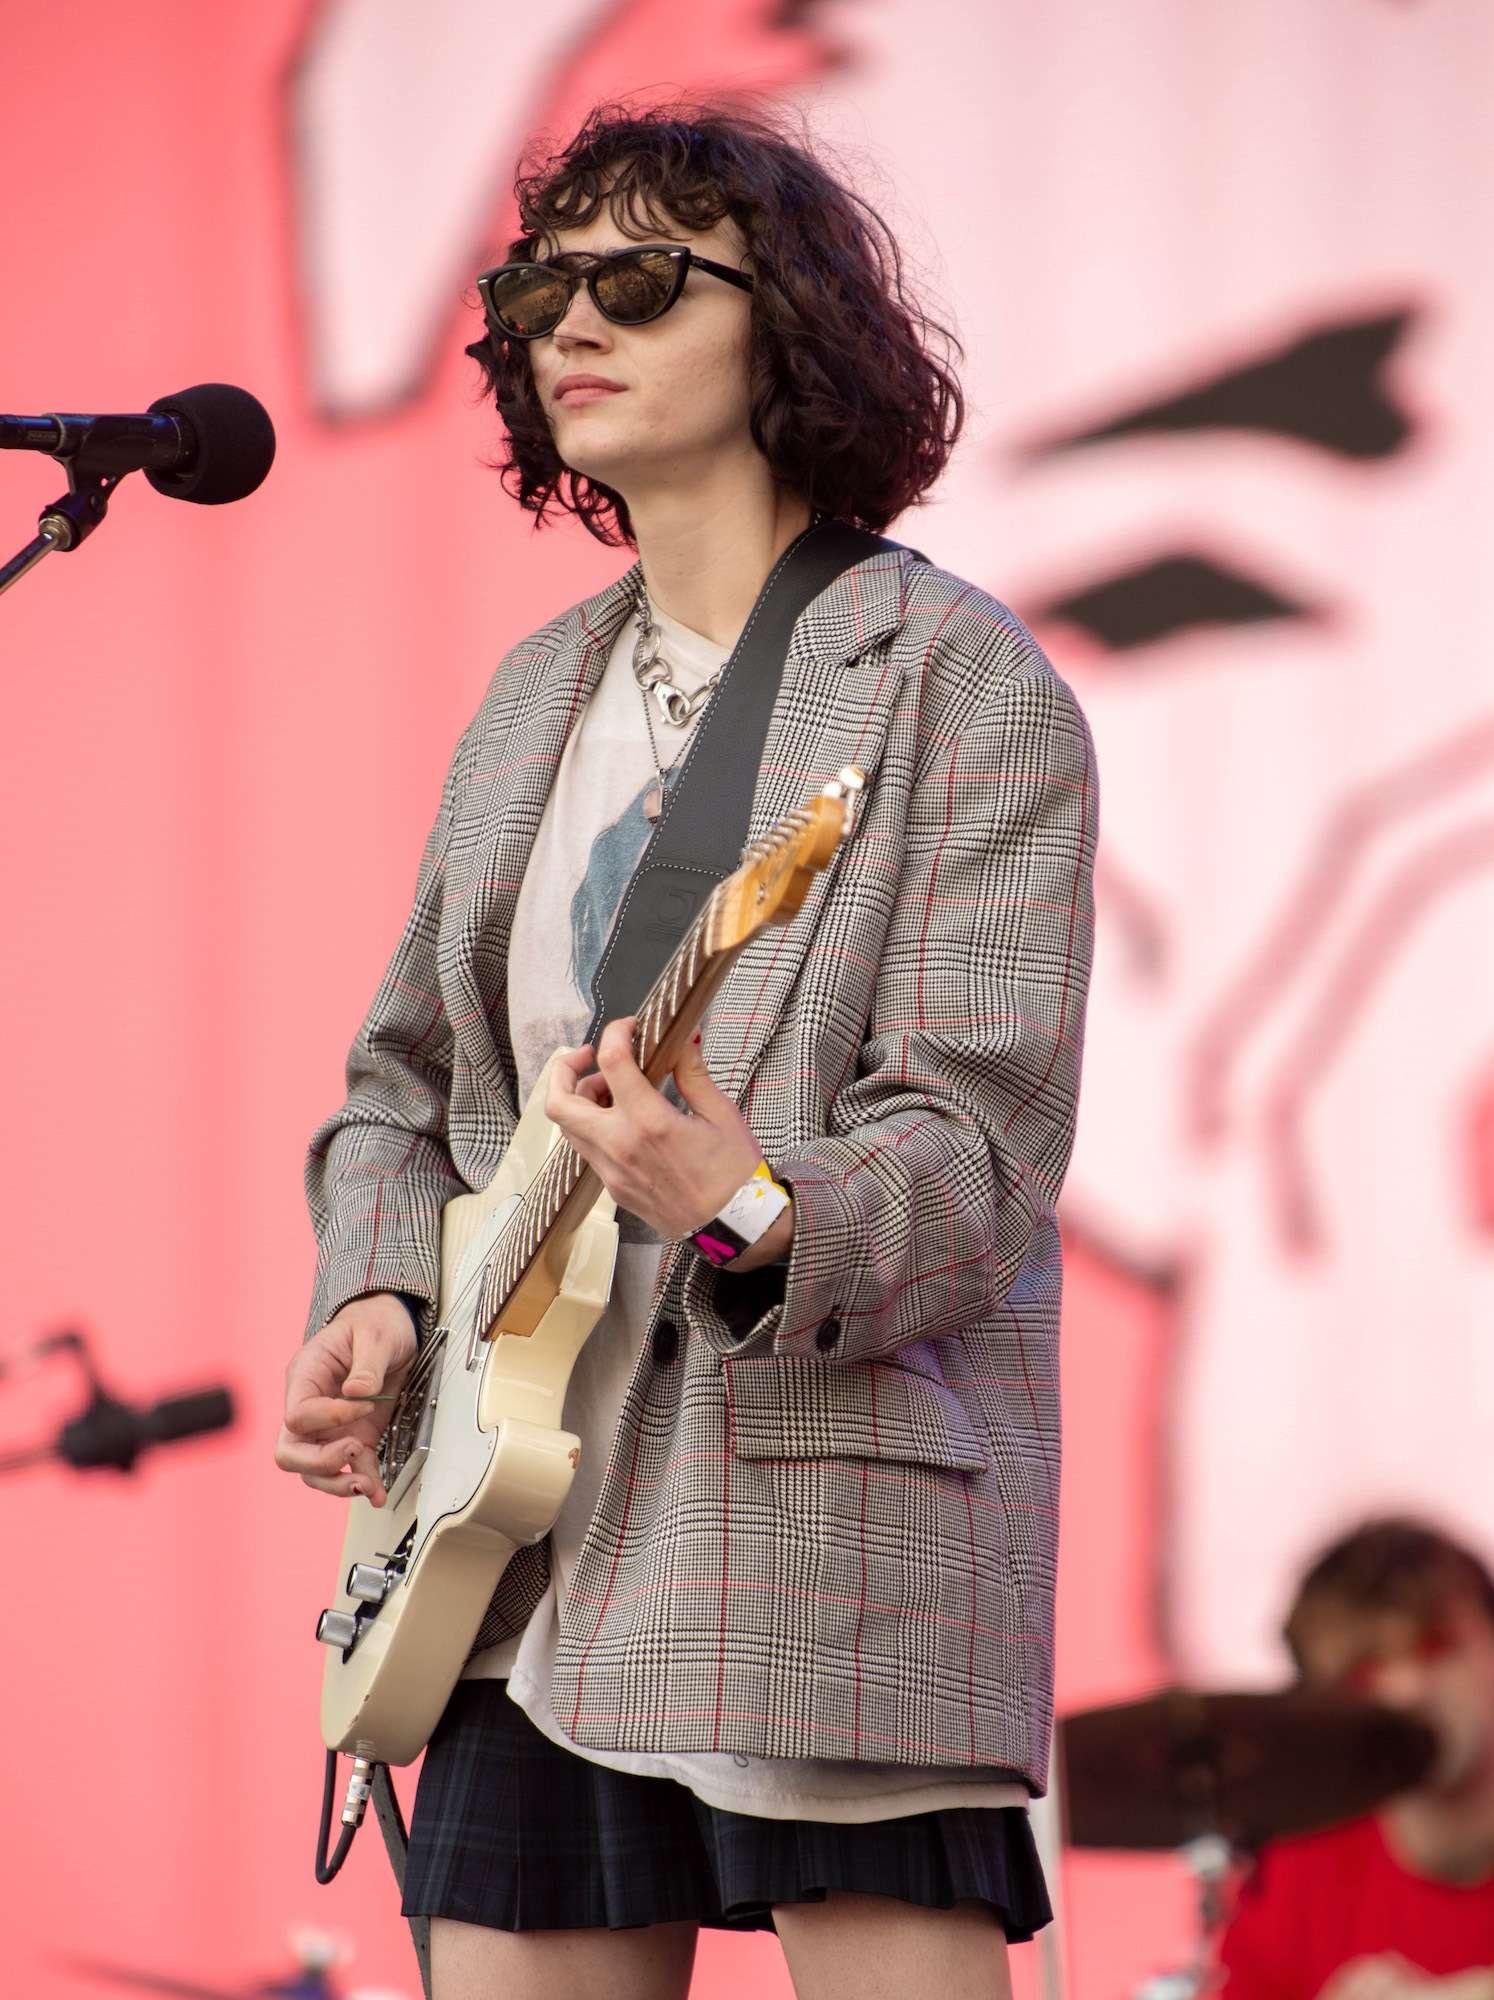 Sir Chloe Live at Lollapalooza [GALLERY] 9